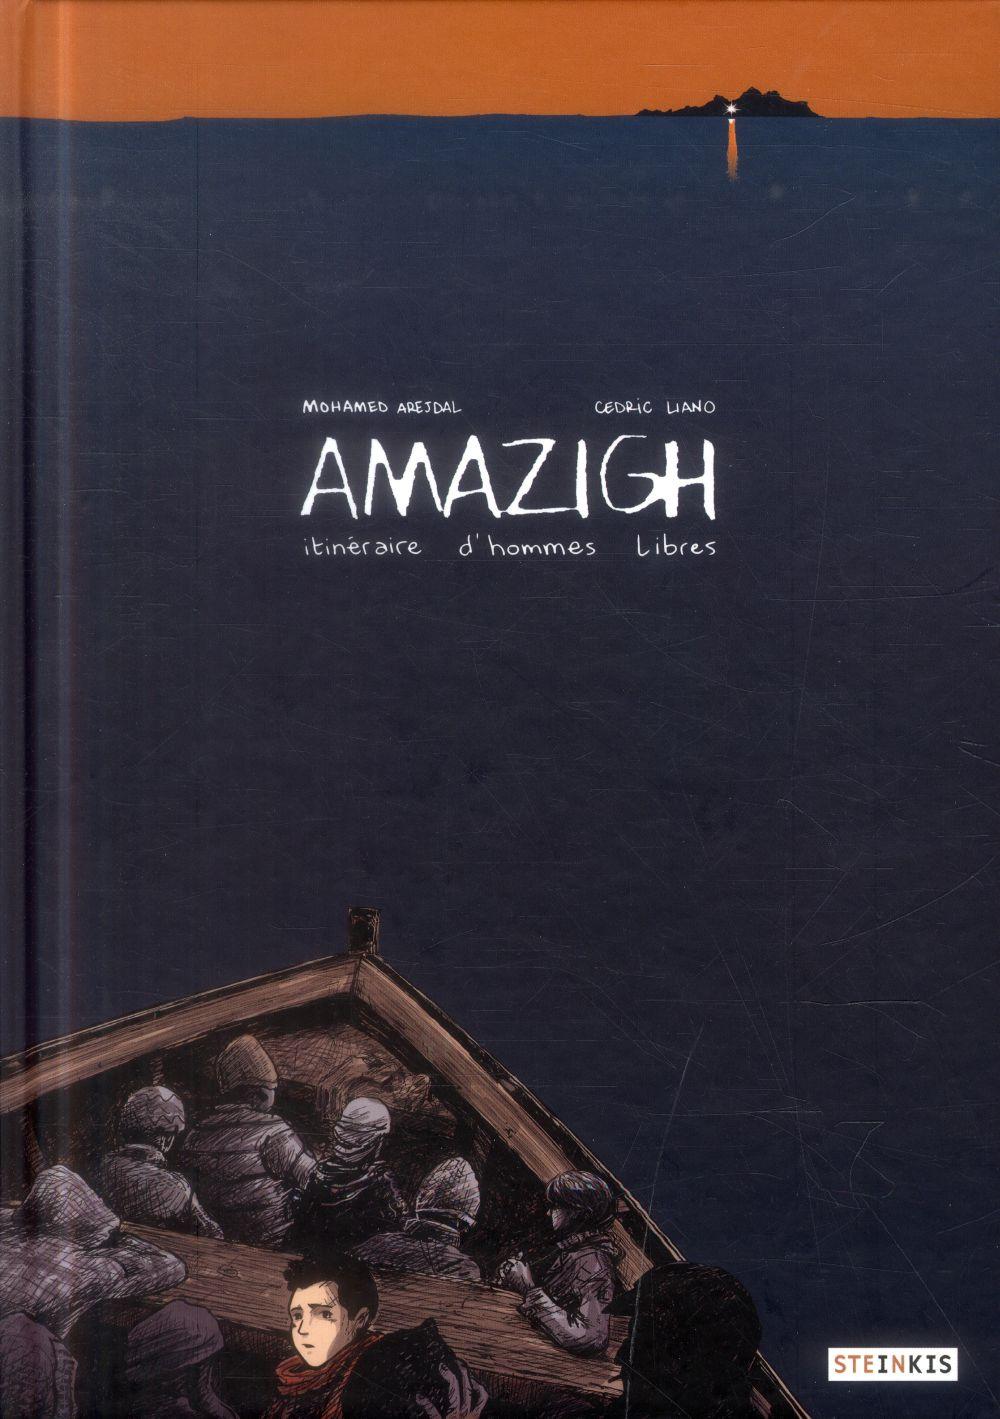 AMAZIGH - ITINERAIRE D'HOMMES LIBRES